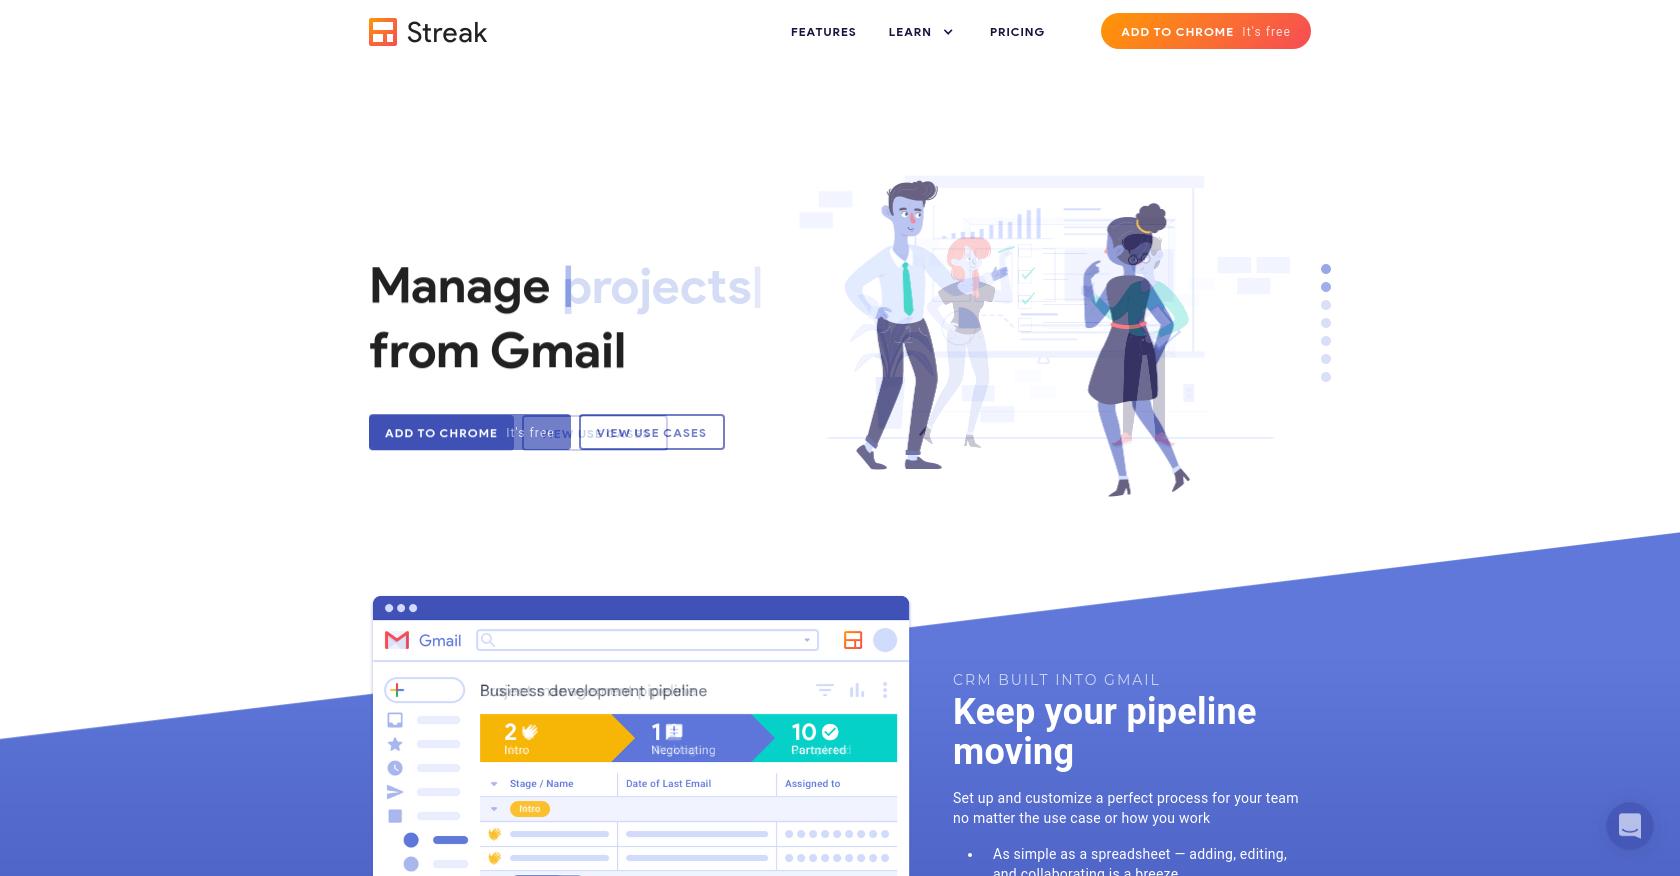 www.streak.com